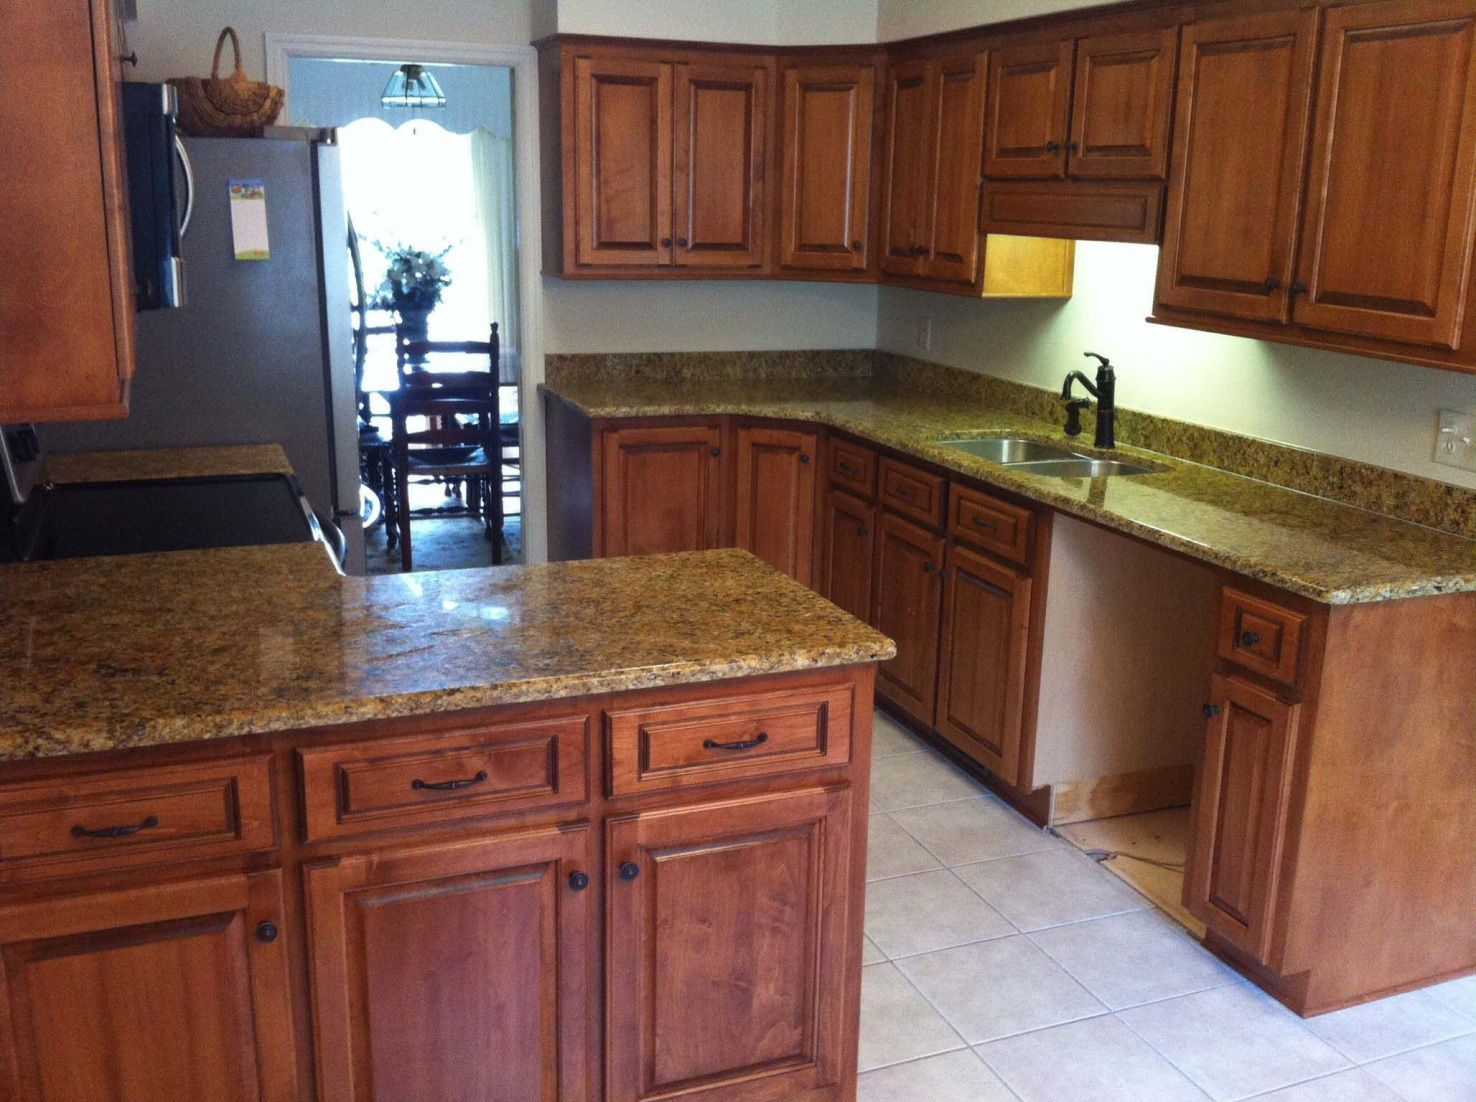 20+ How Much Are Granite Countertops Per Square Foot   Kitchen Cabinet  Lighting Ideas Check